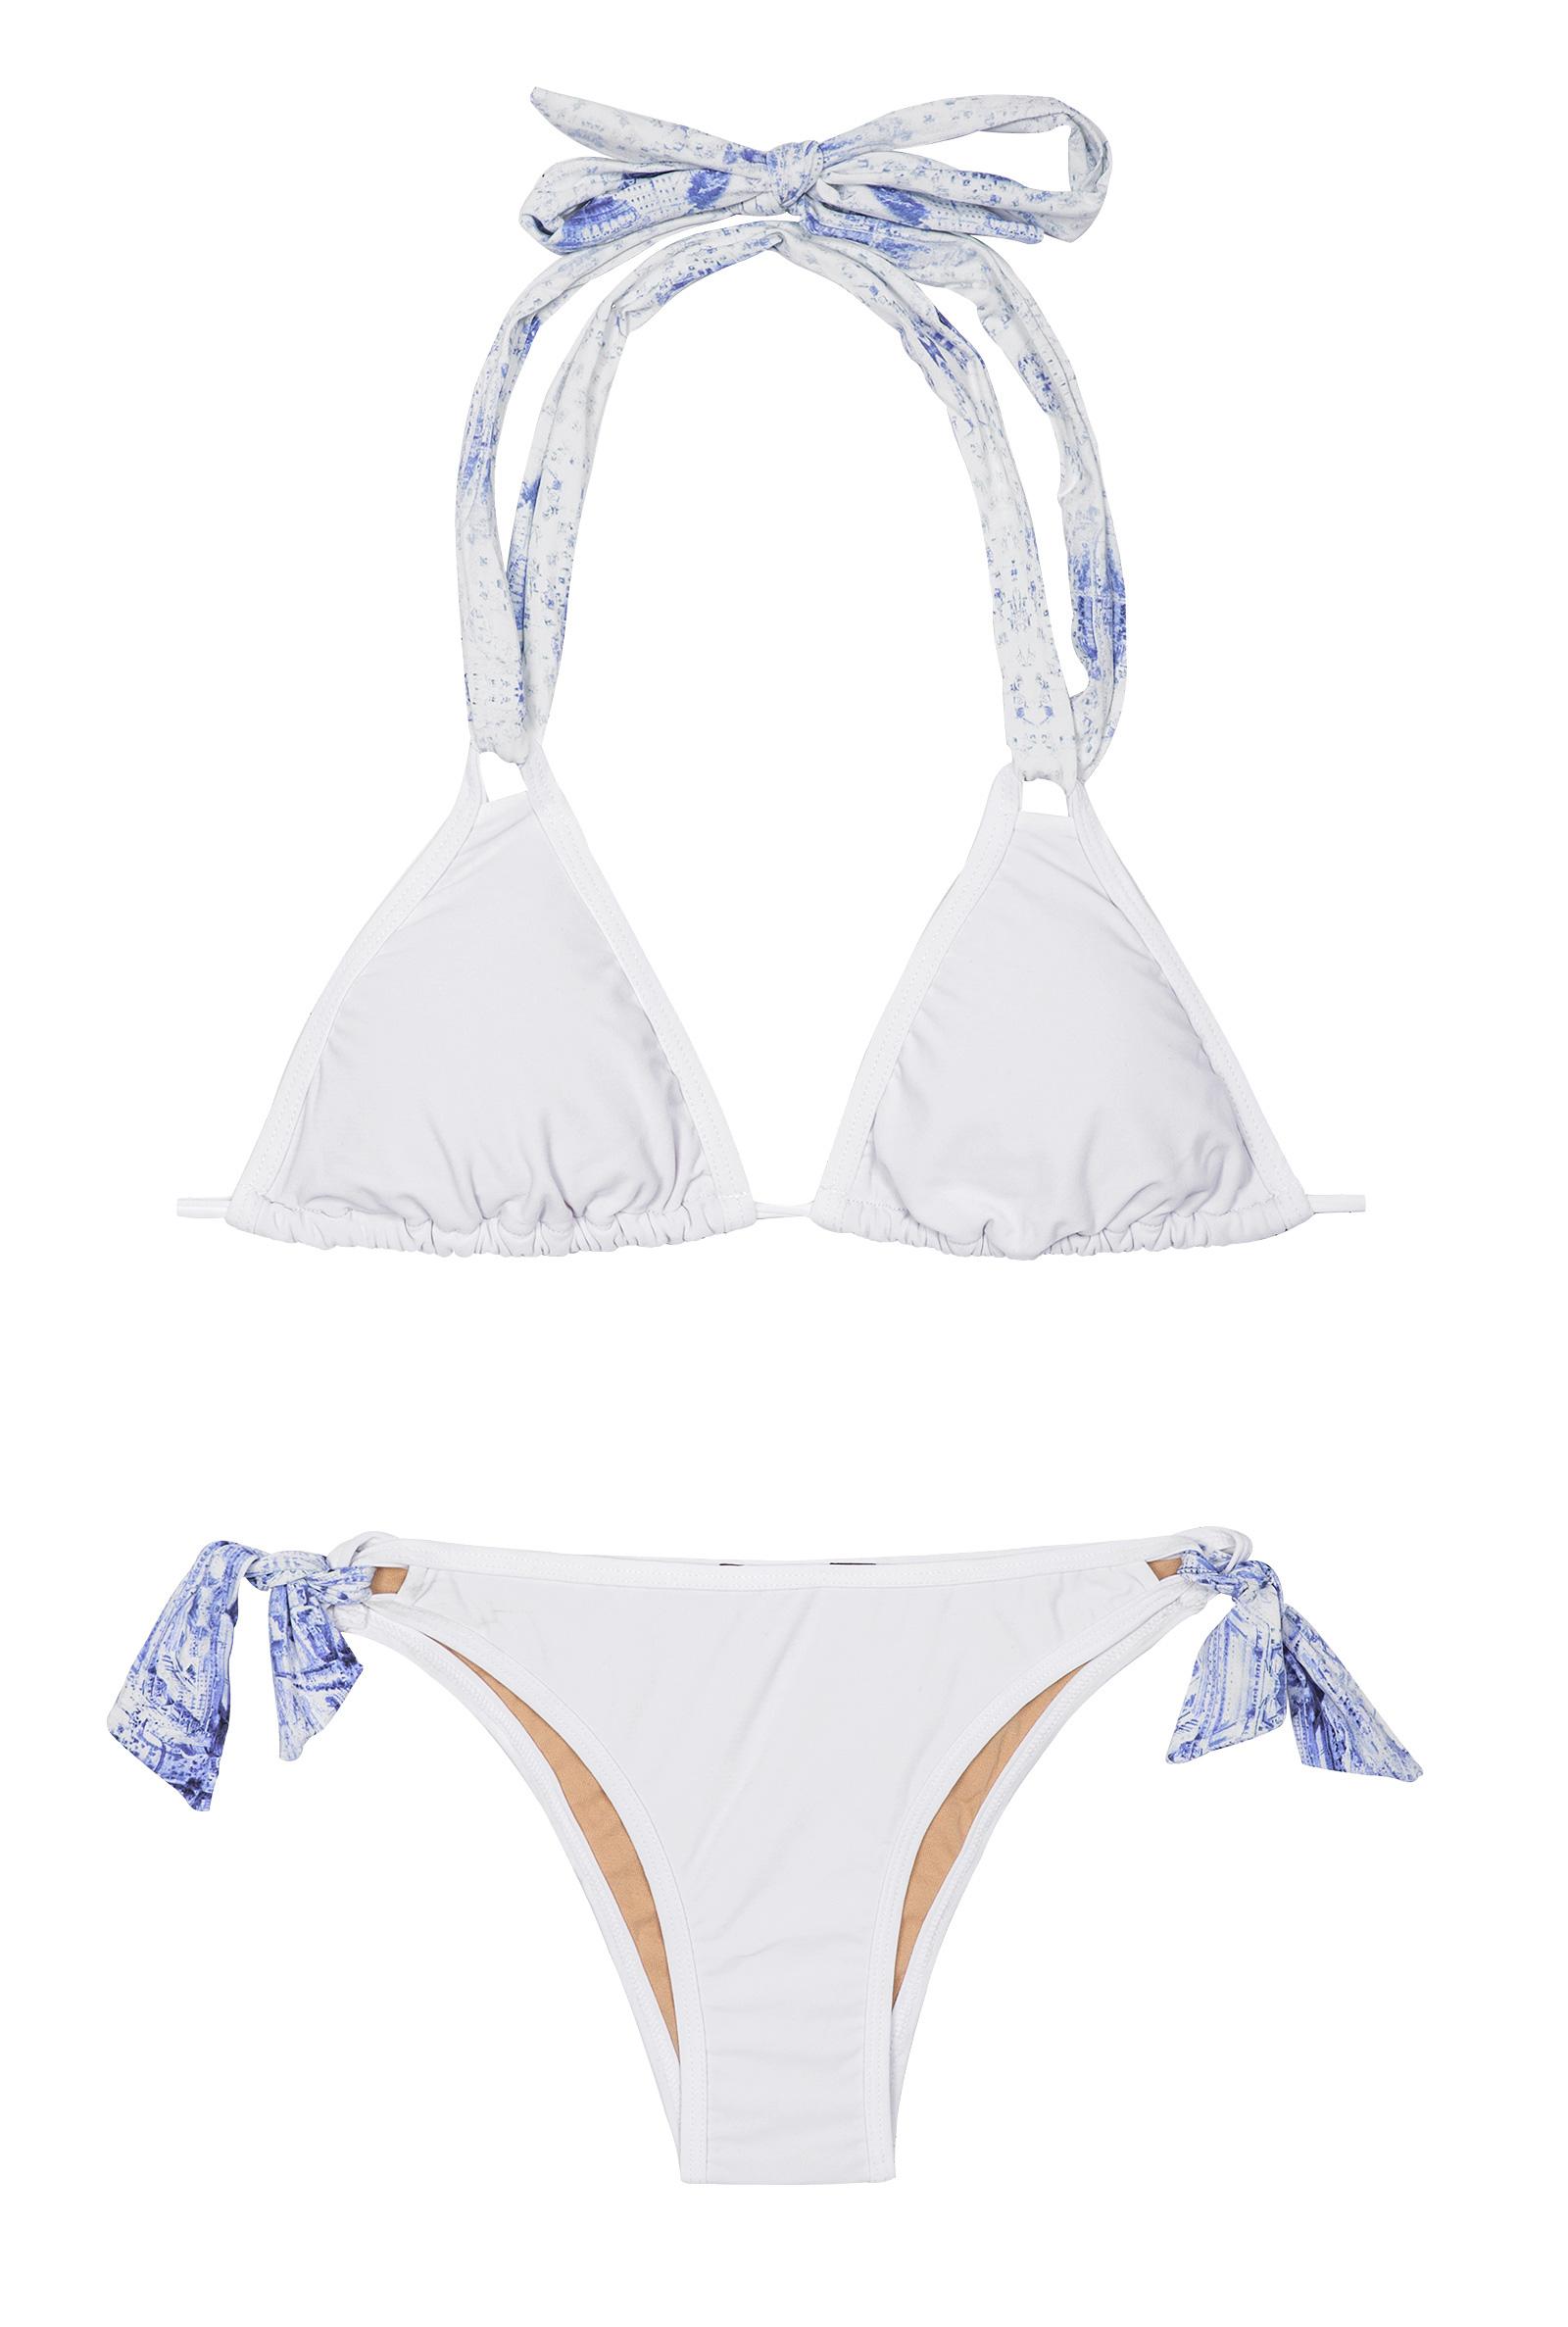 kiminis bikini triangle blanc liens bleus imprim s kas paris. Black Bedroom Furniture Sets. Home Design Ideas